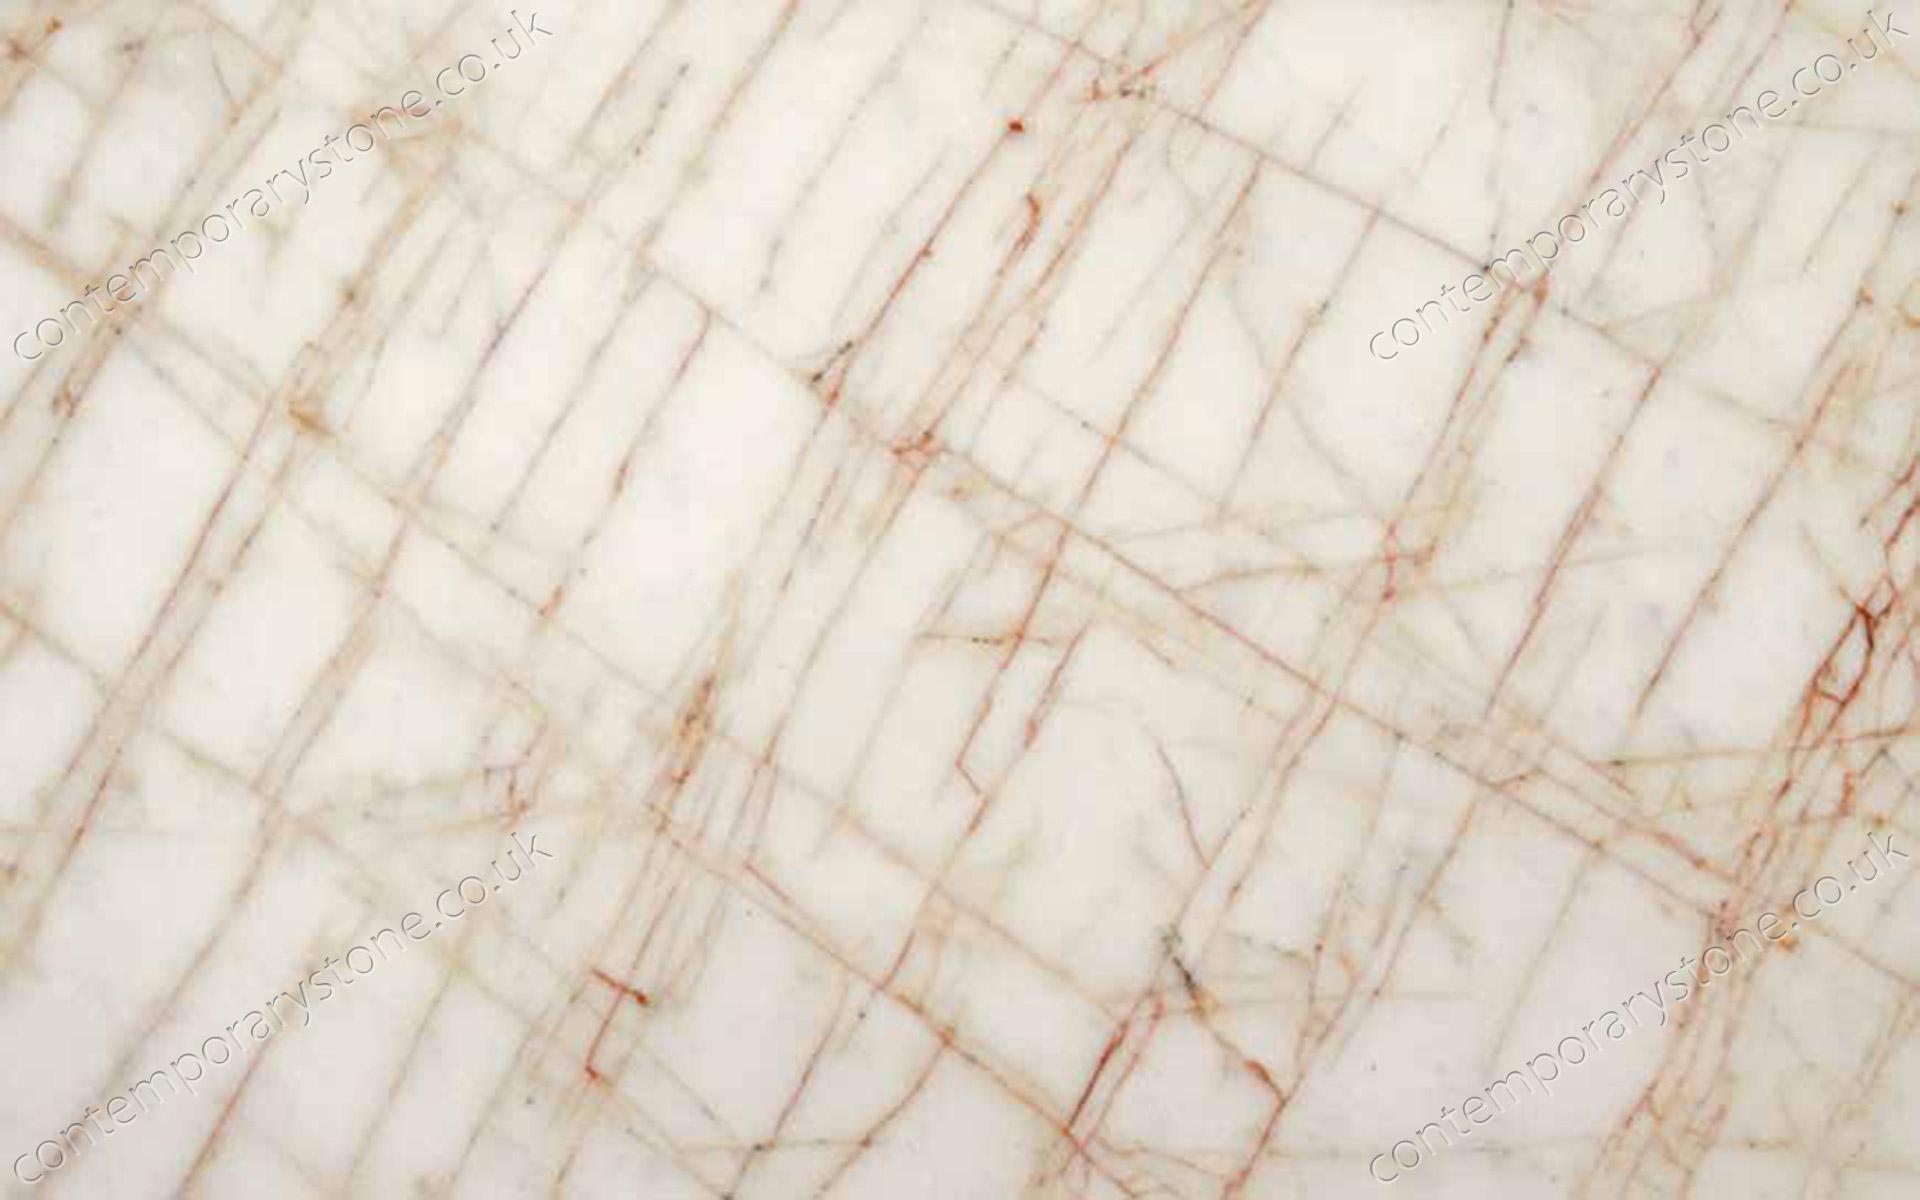 Golden Spider marble close-up